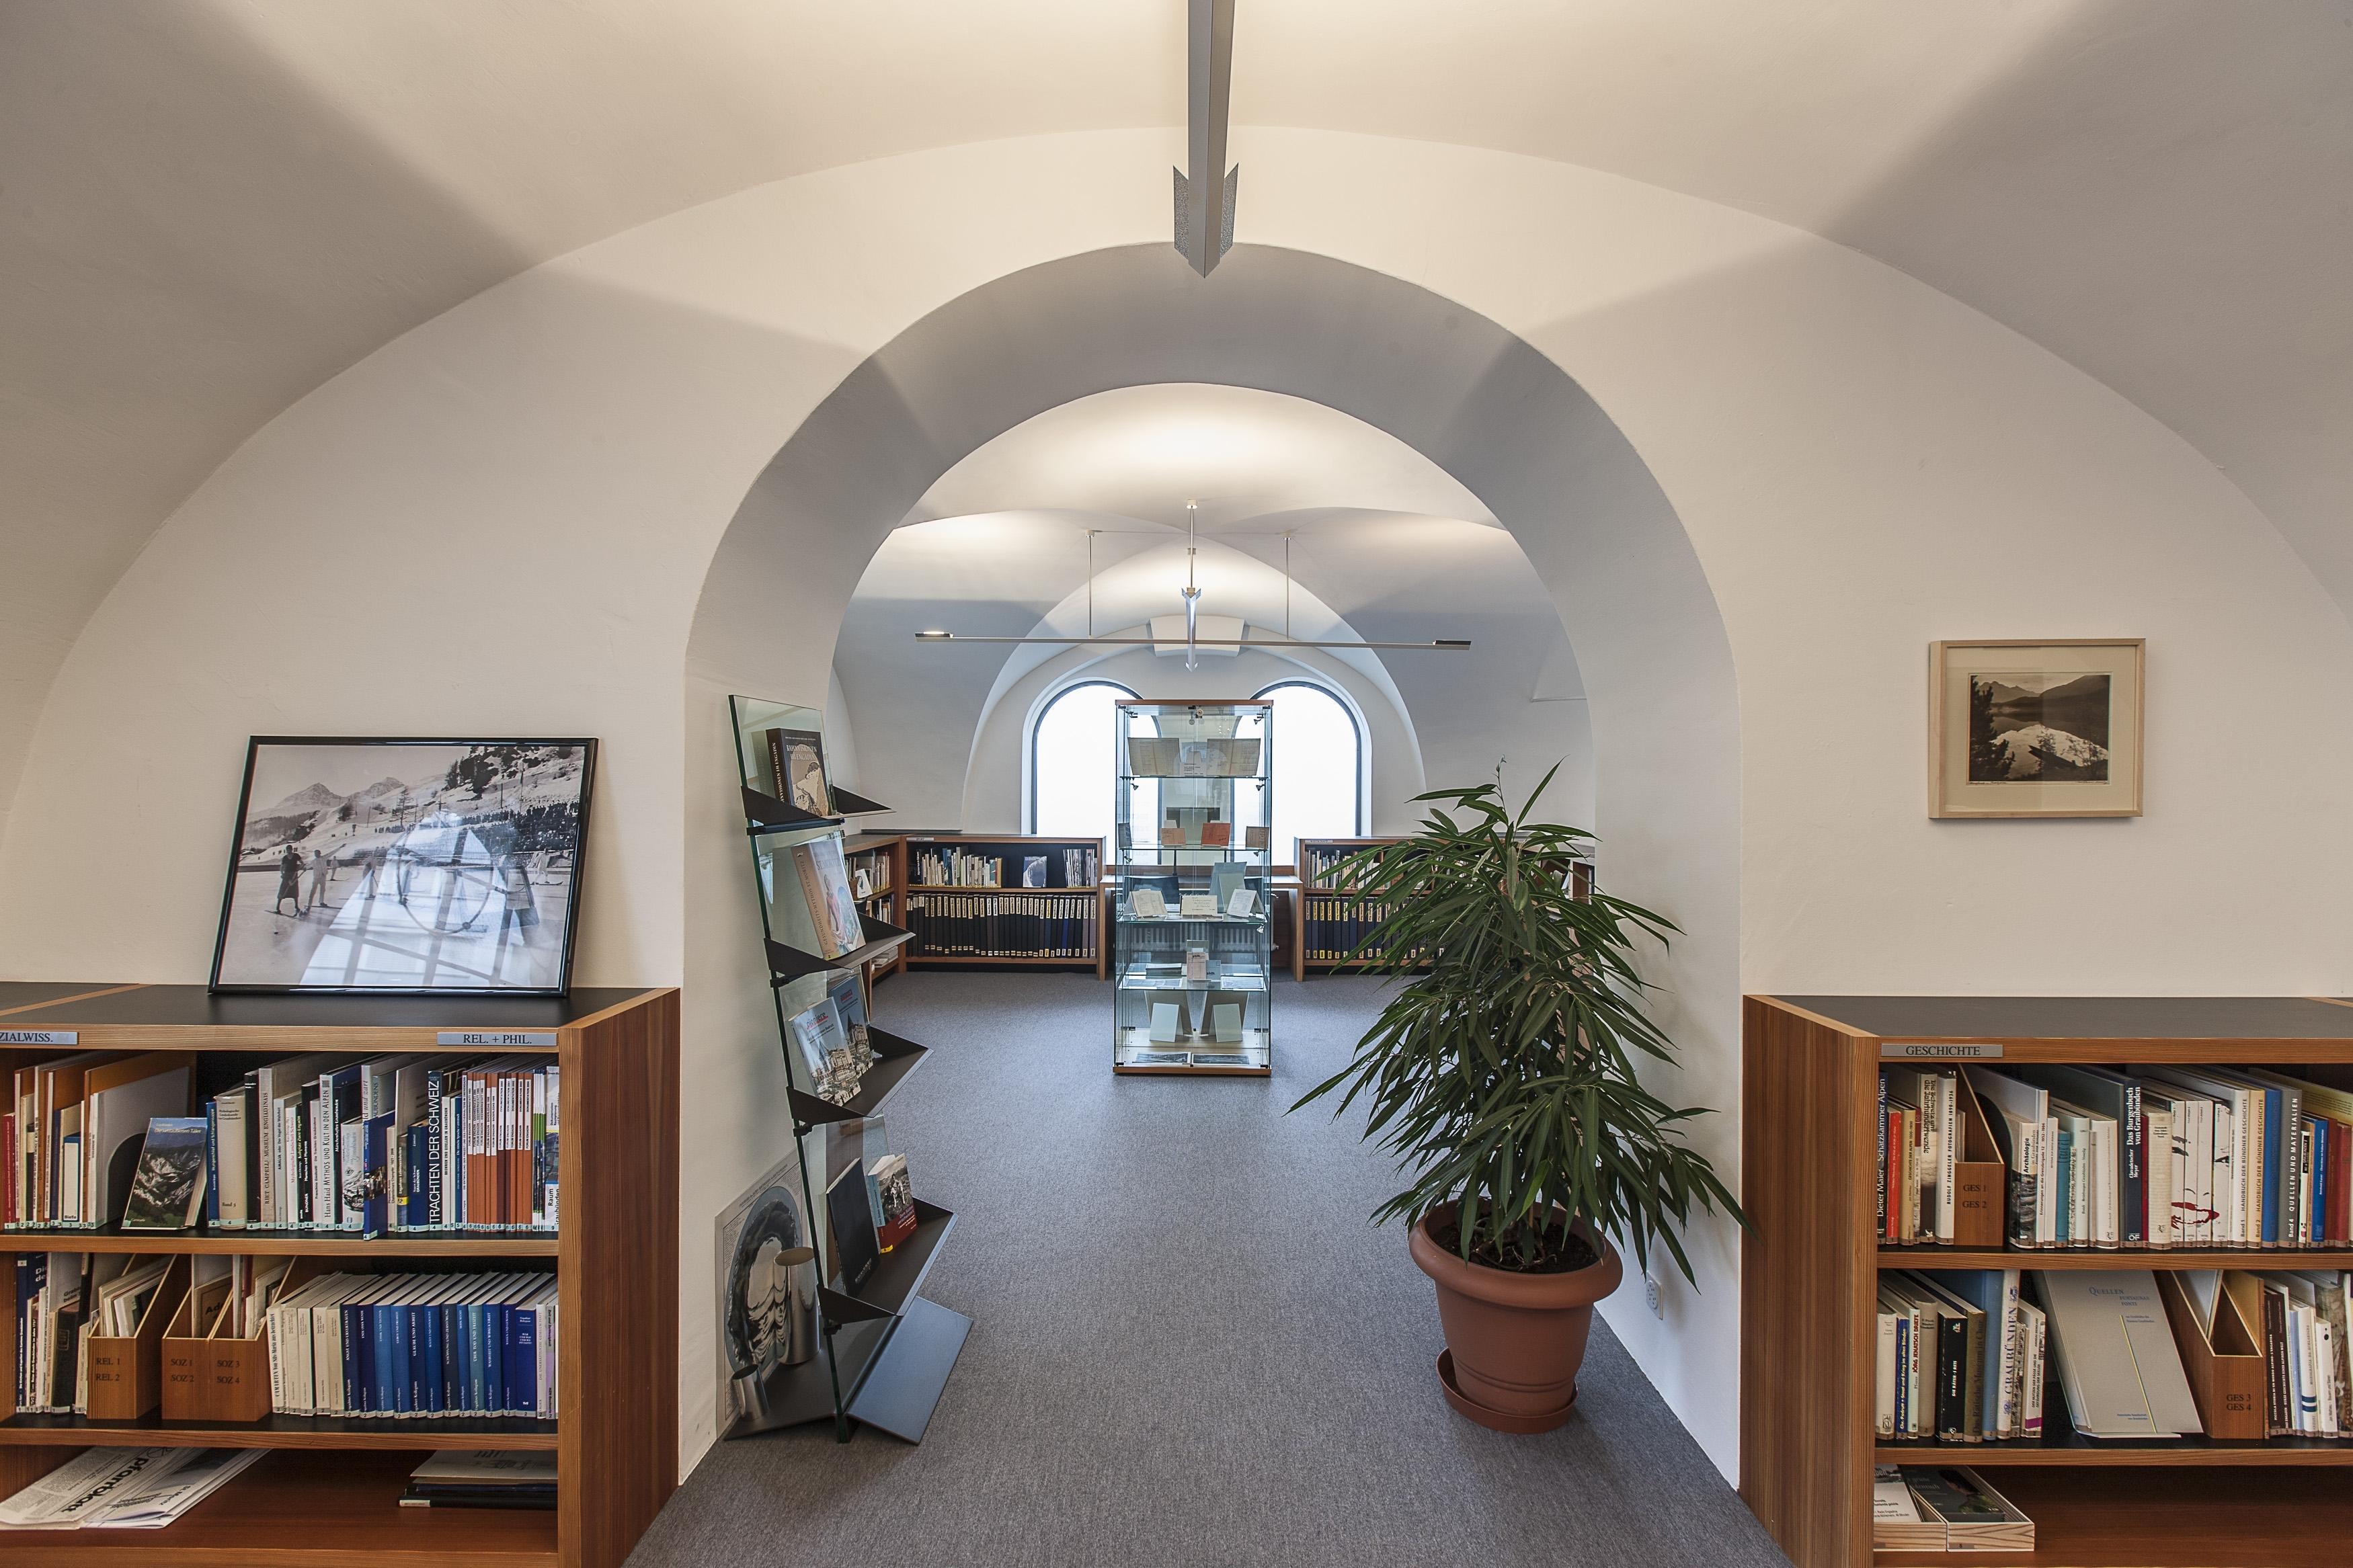 Dokumentationsbibliothek St. Moritz Slide 1